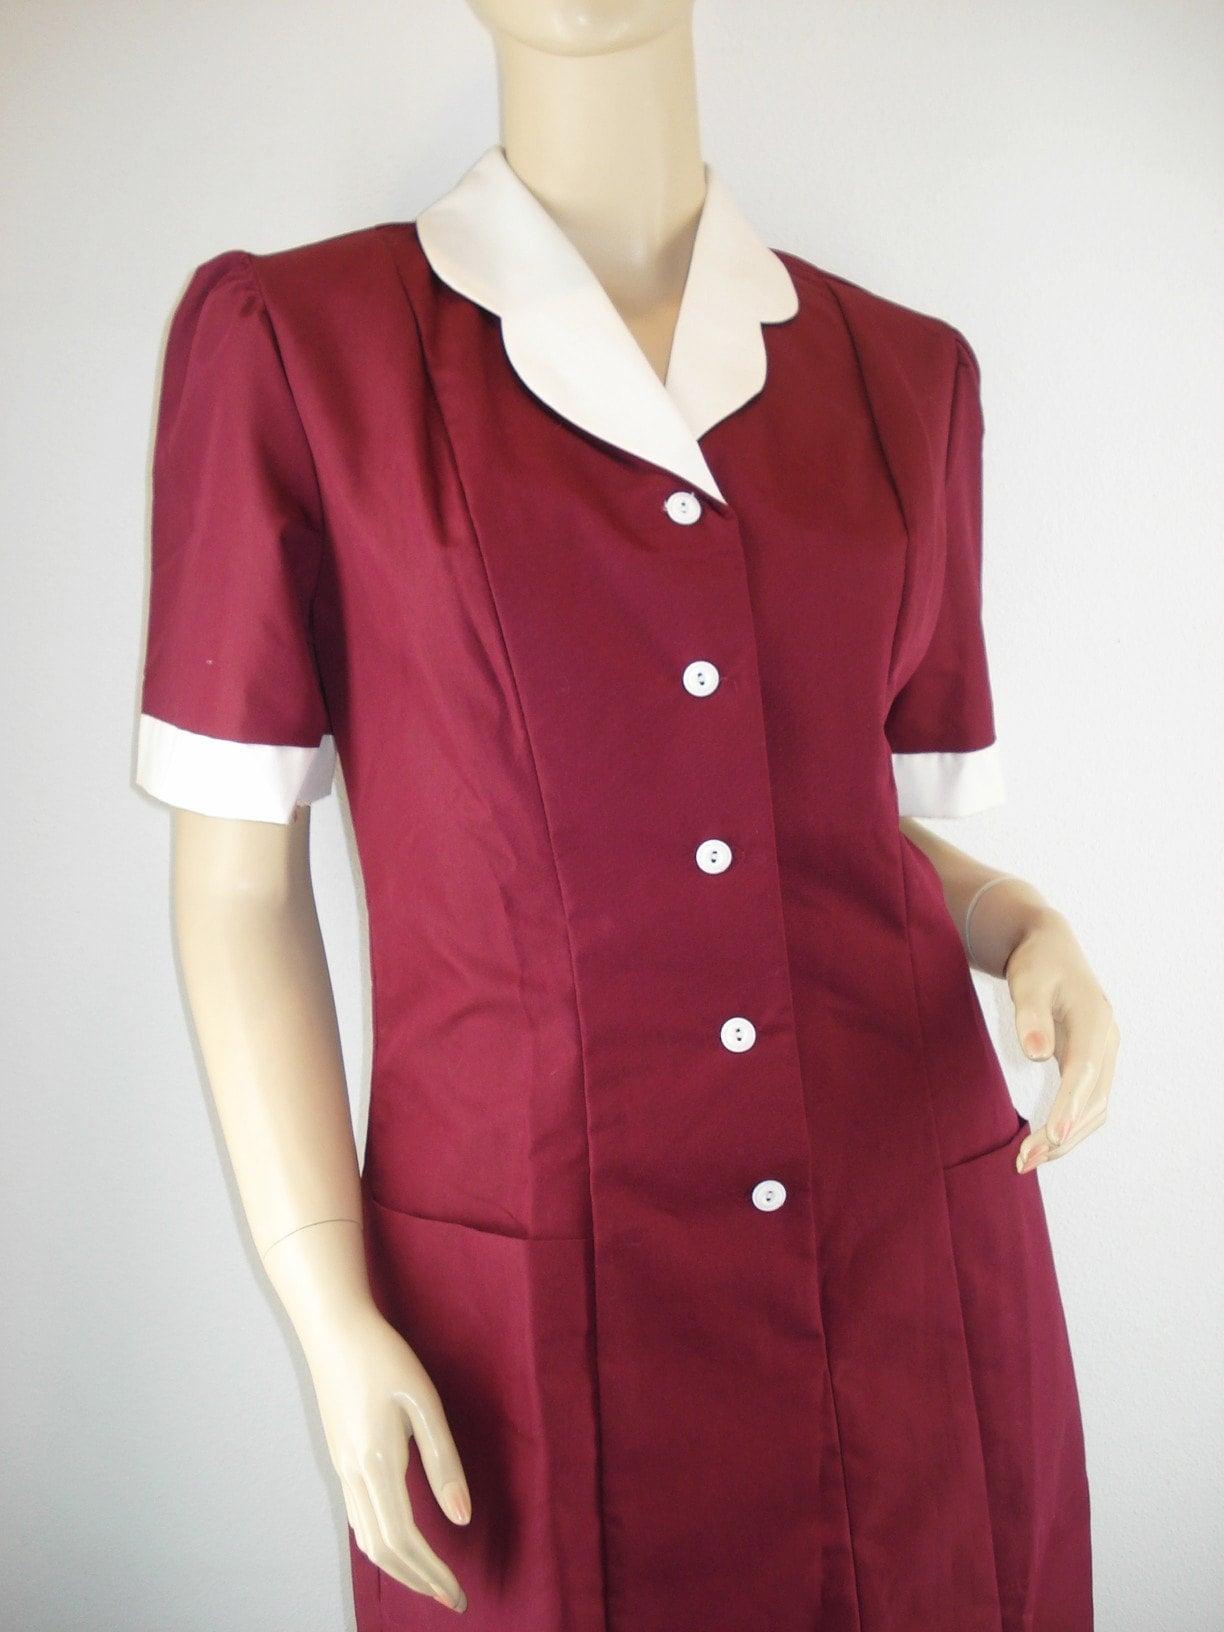 Vintage Burgundy Crest Waitress Uniform Dress Costume Small